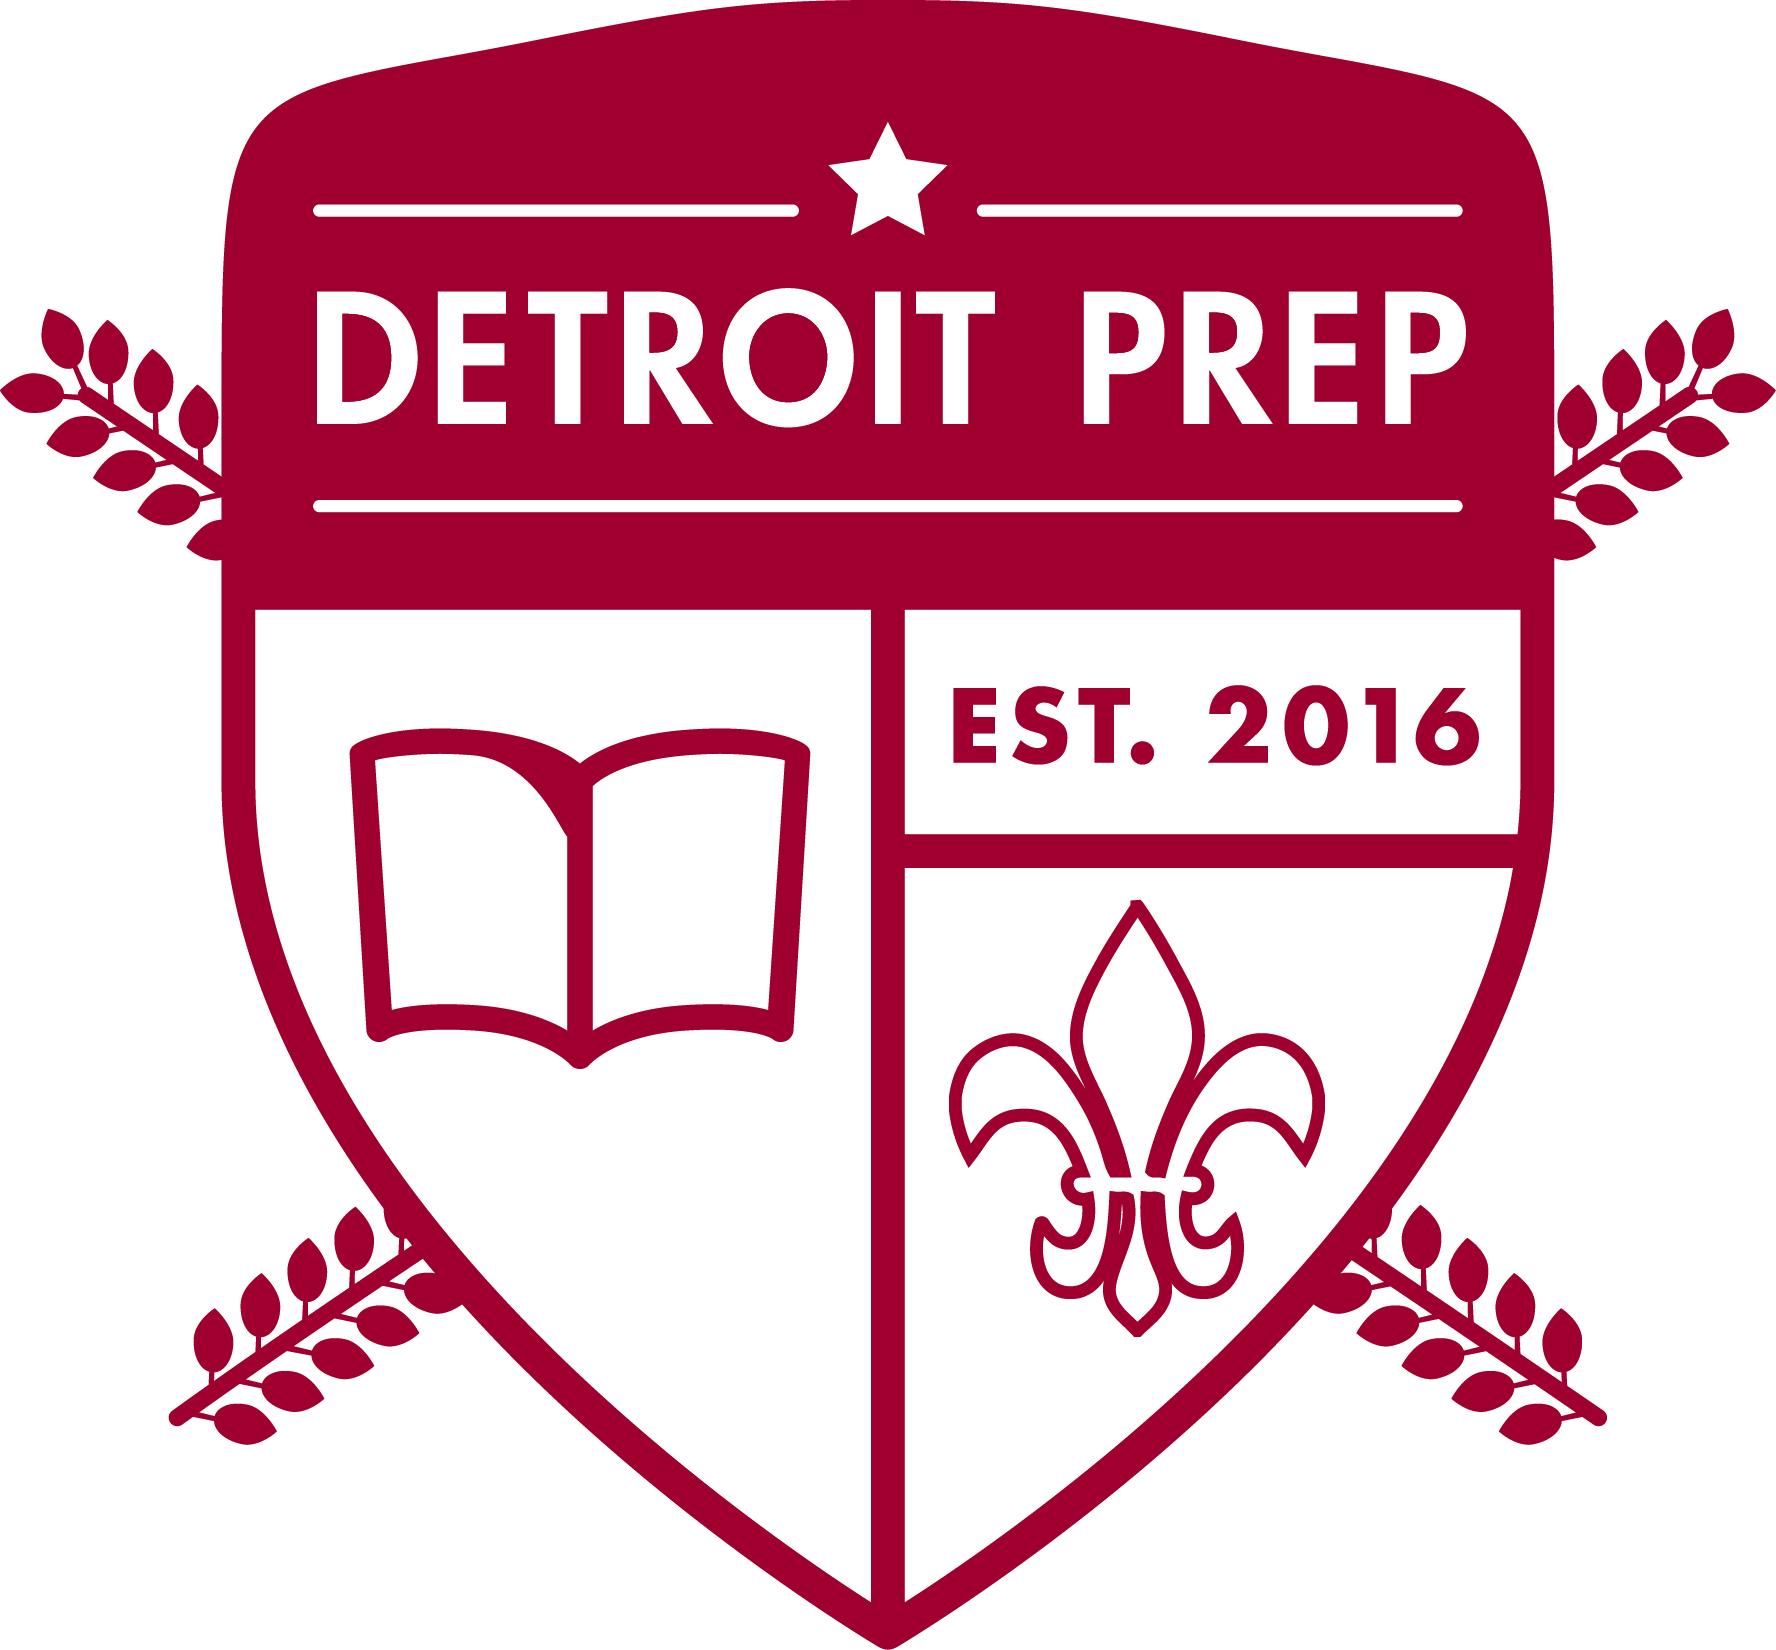 Detroit Prep